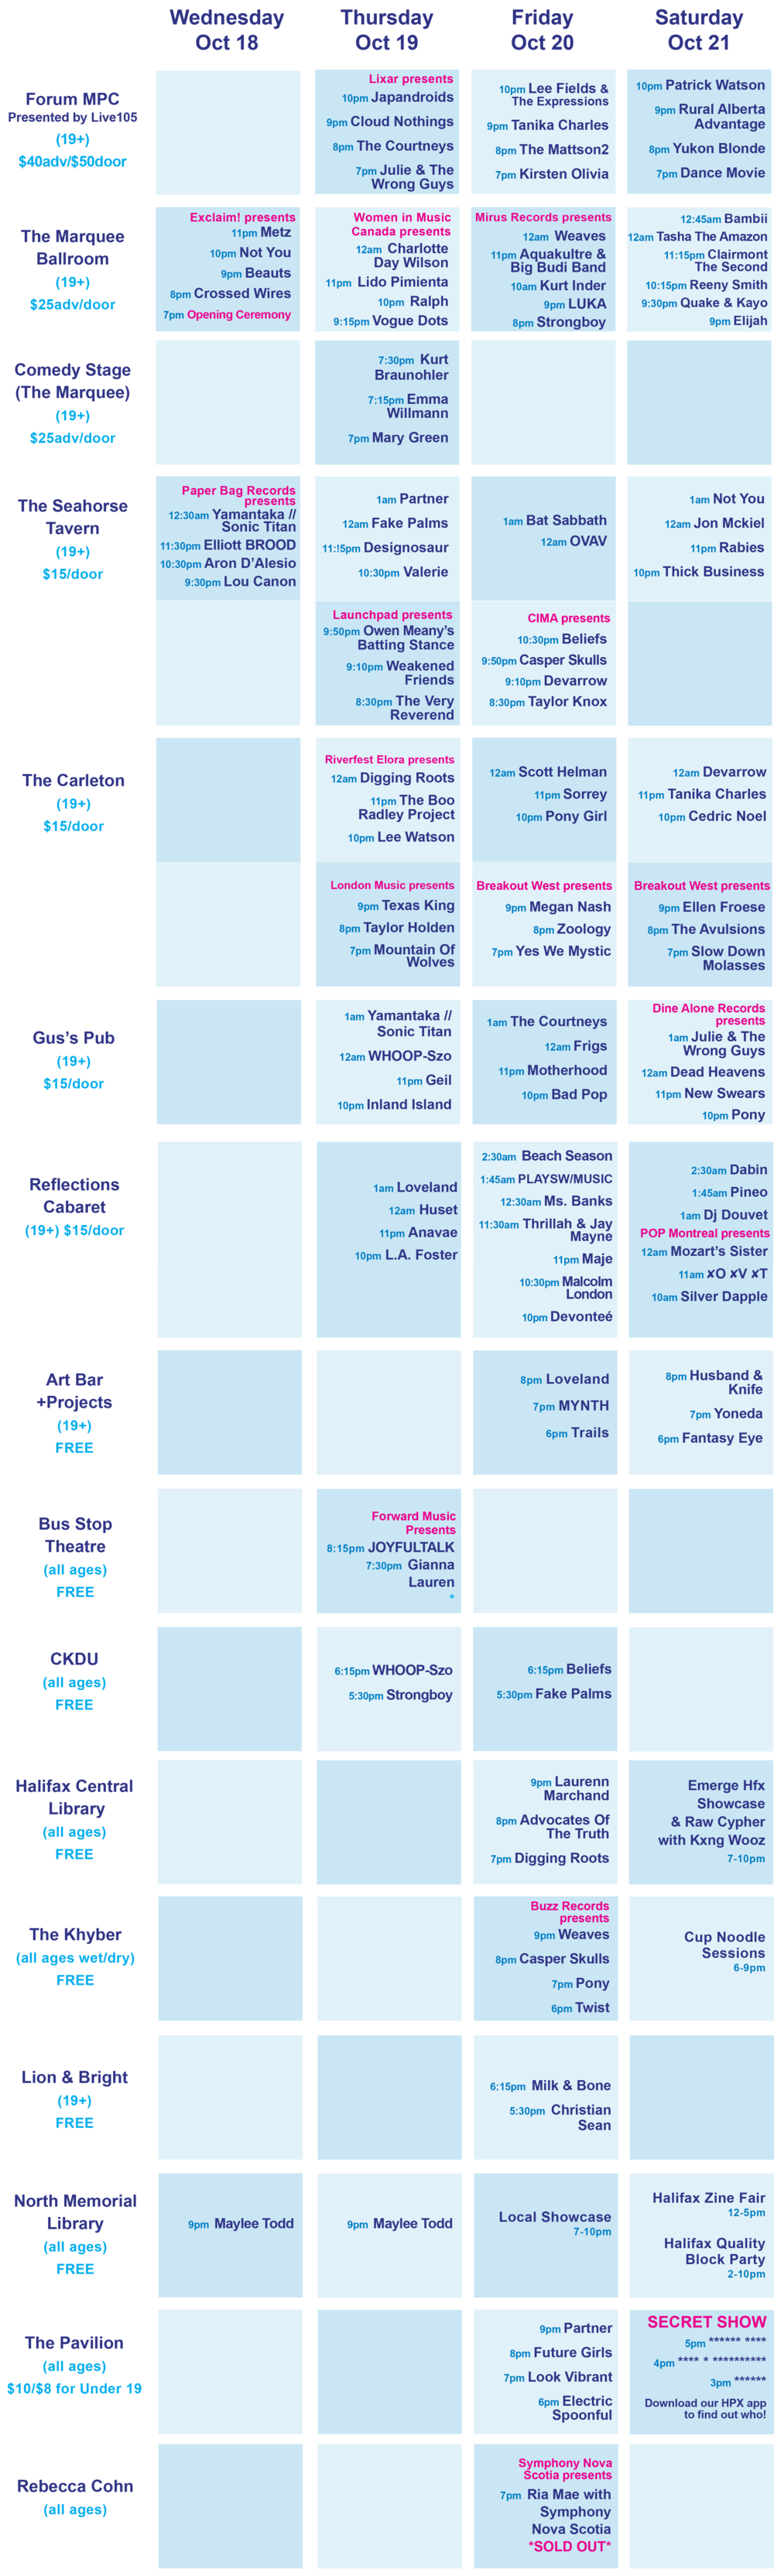 Web schedule.png